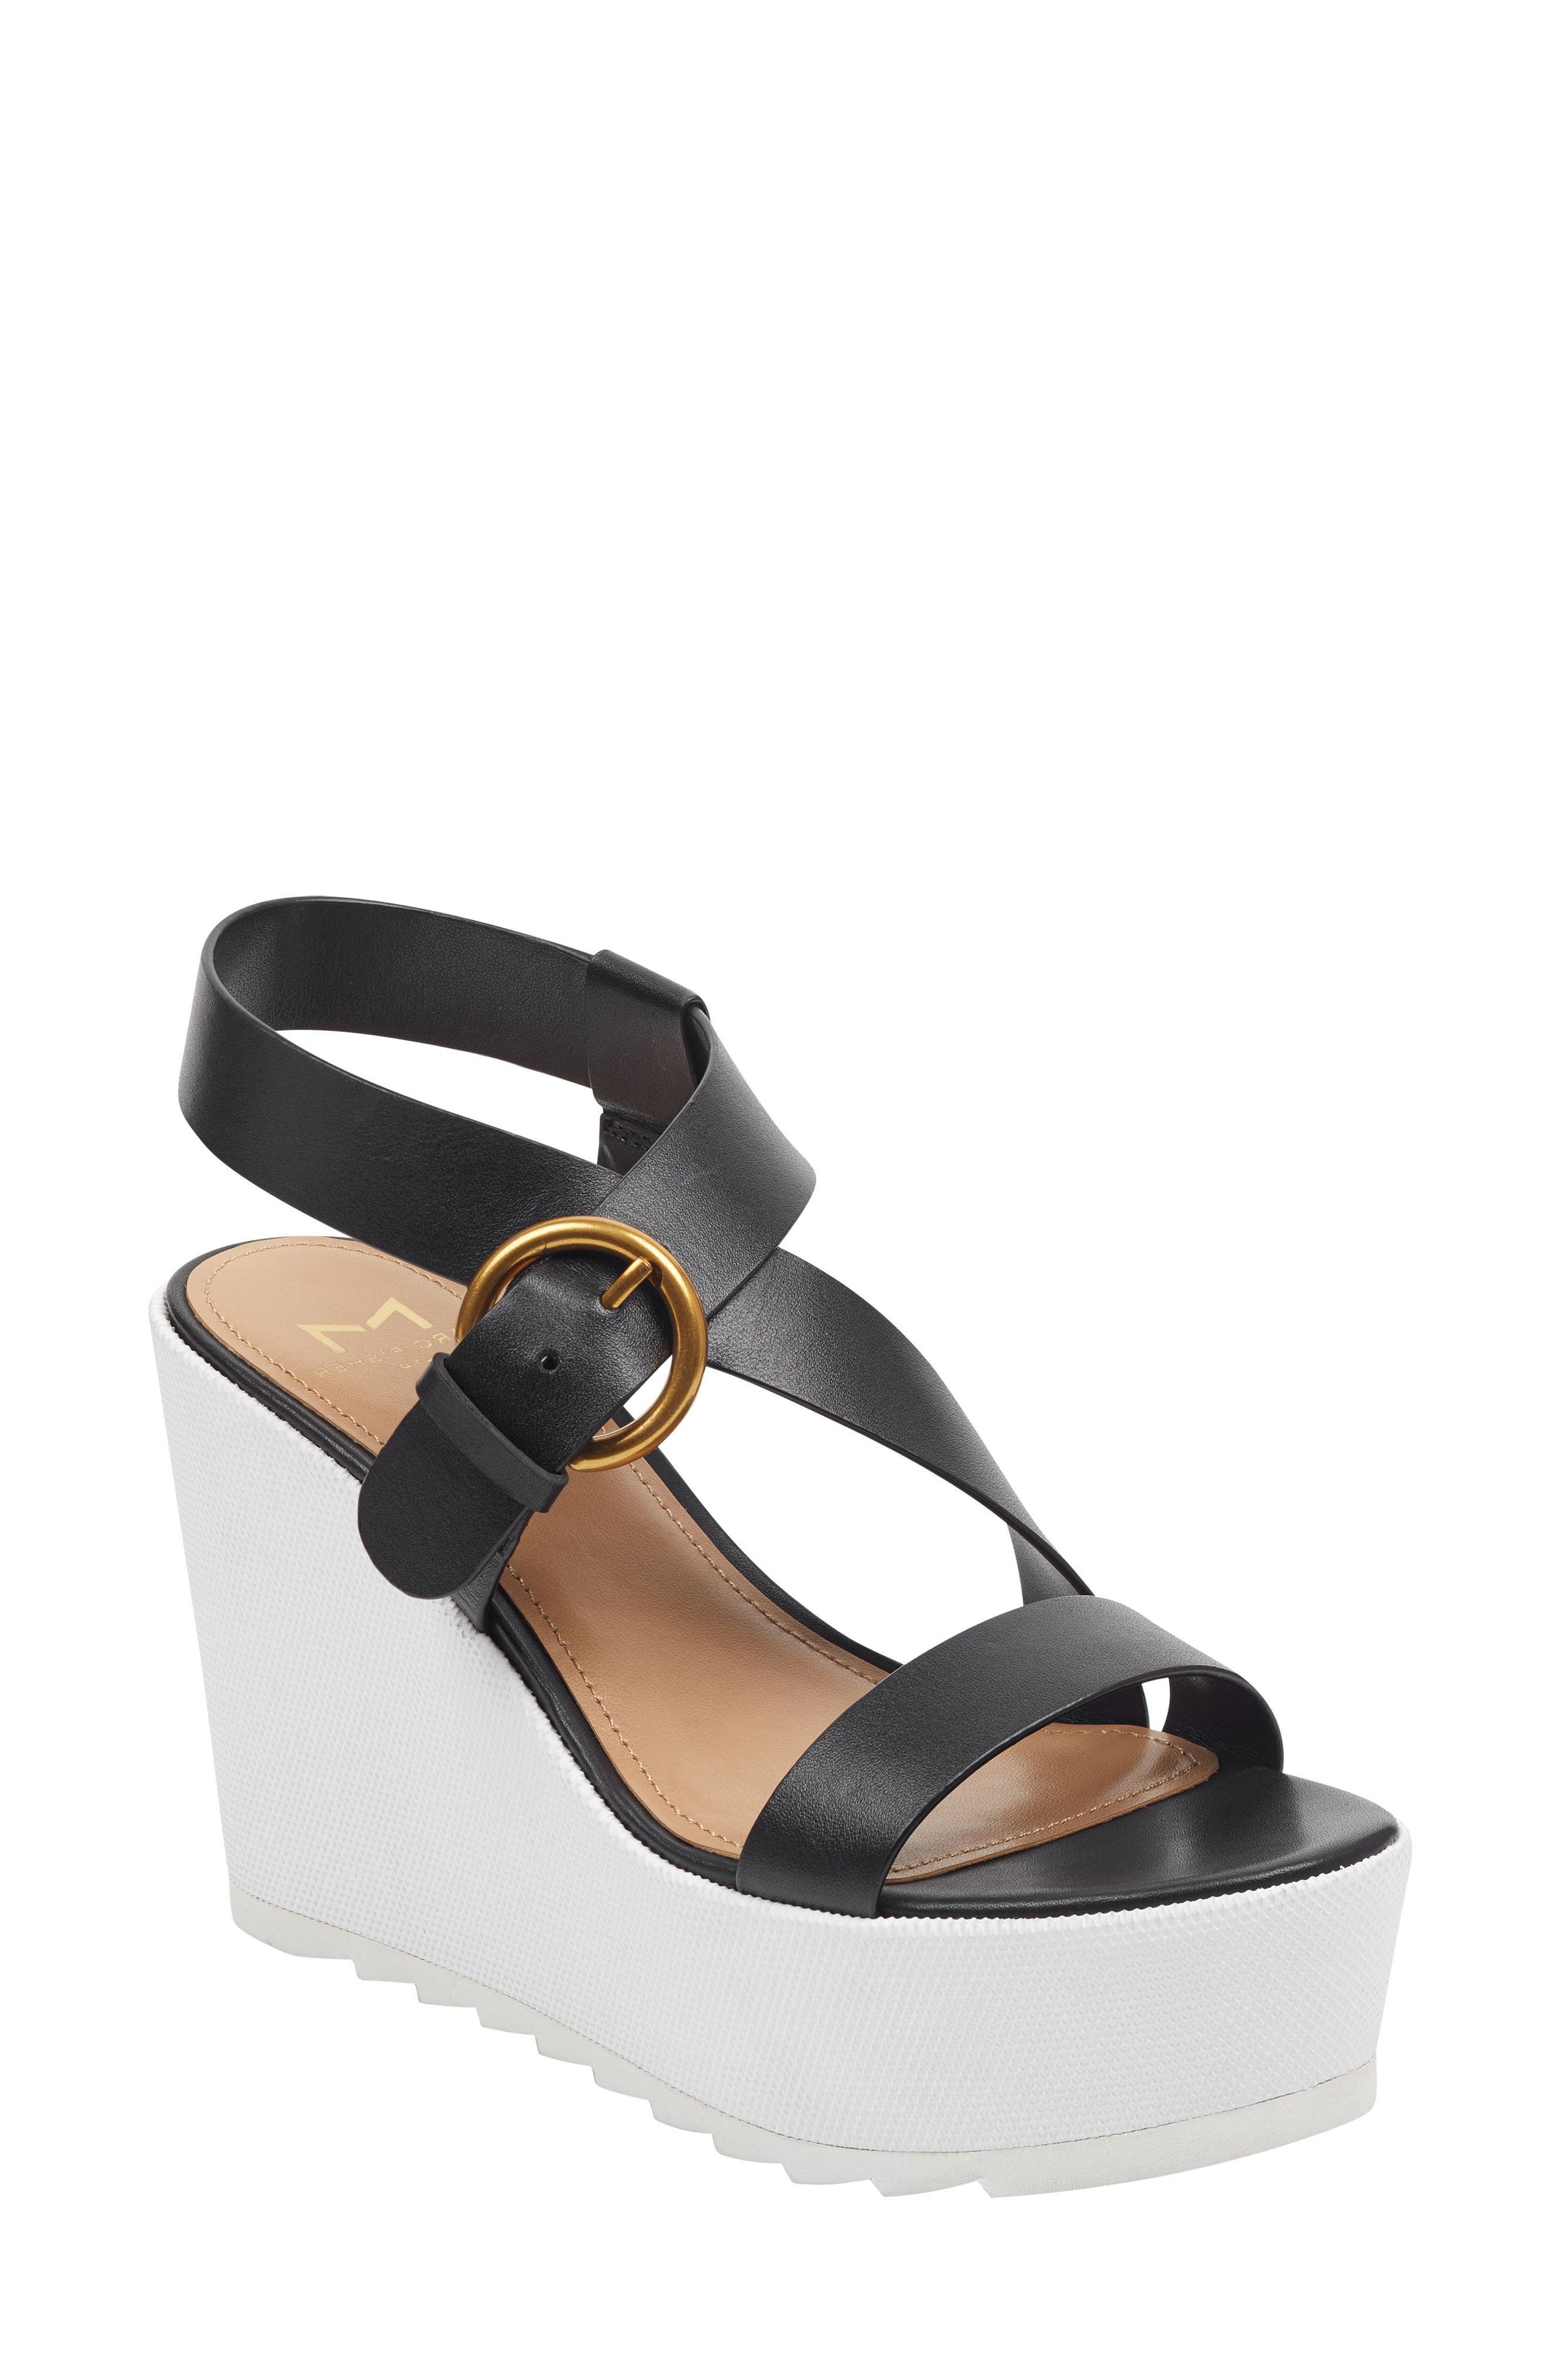 Marc Fisher Ltd Mahina Platform Wedge Sandal, Black